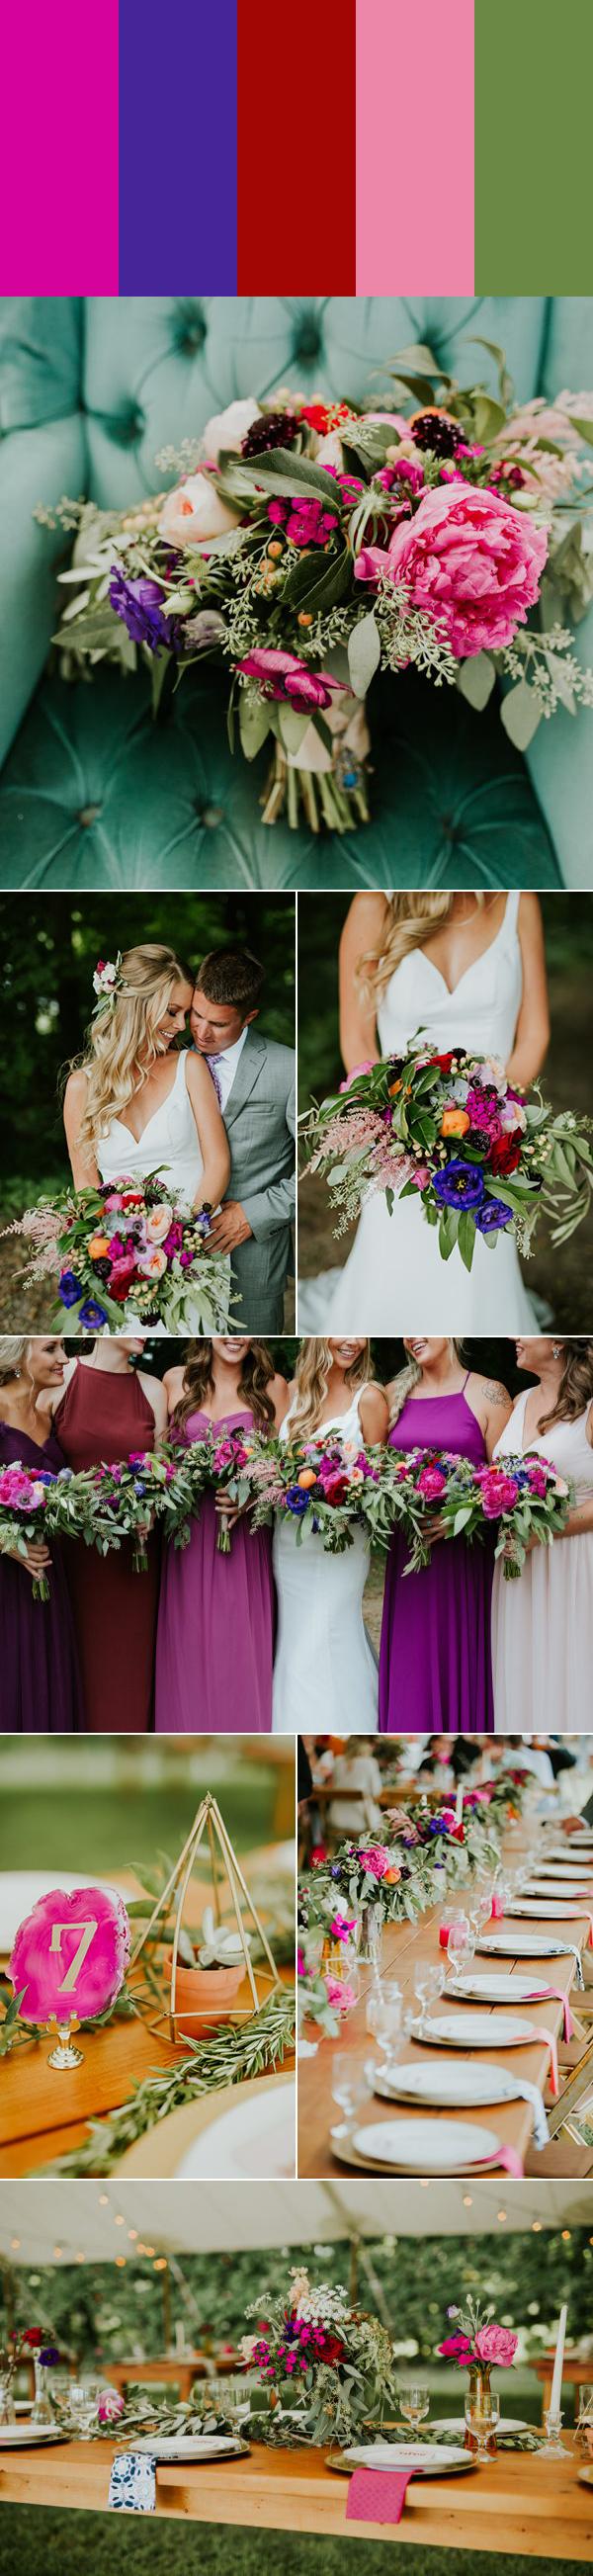 7 Swoon Worthy Pink Wedding Color Palettes Junebug Weddings